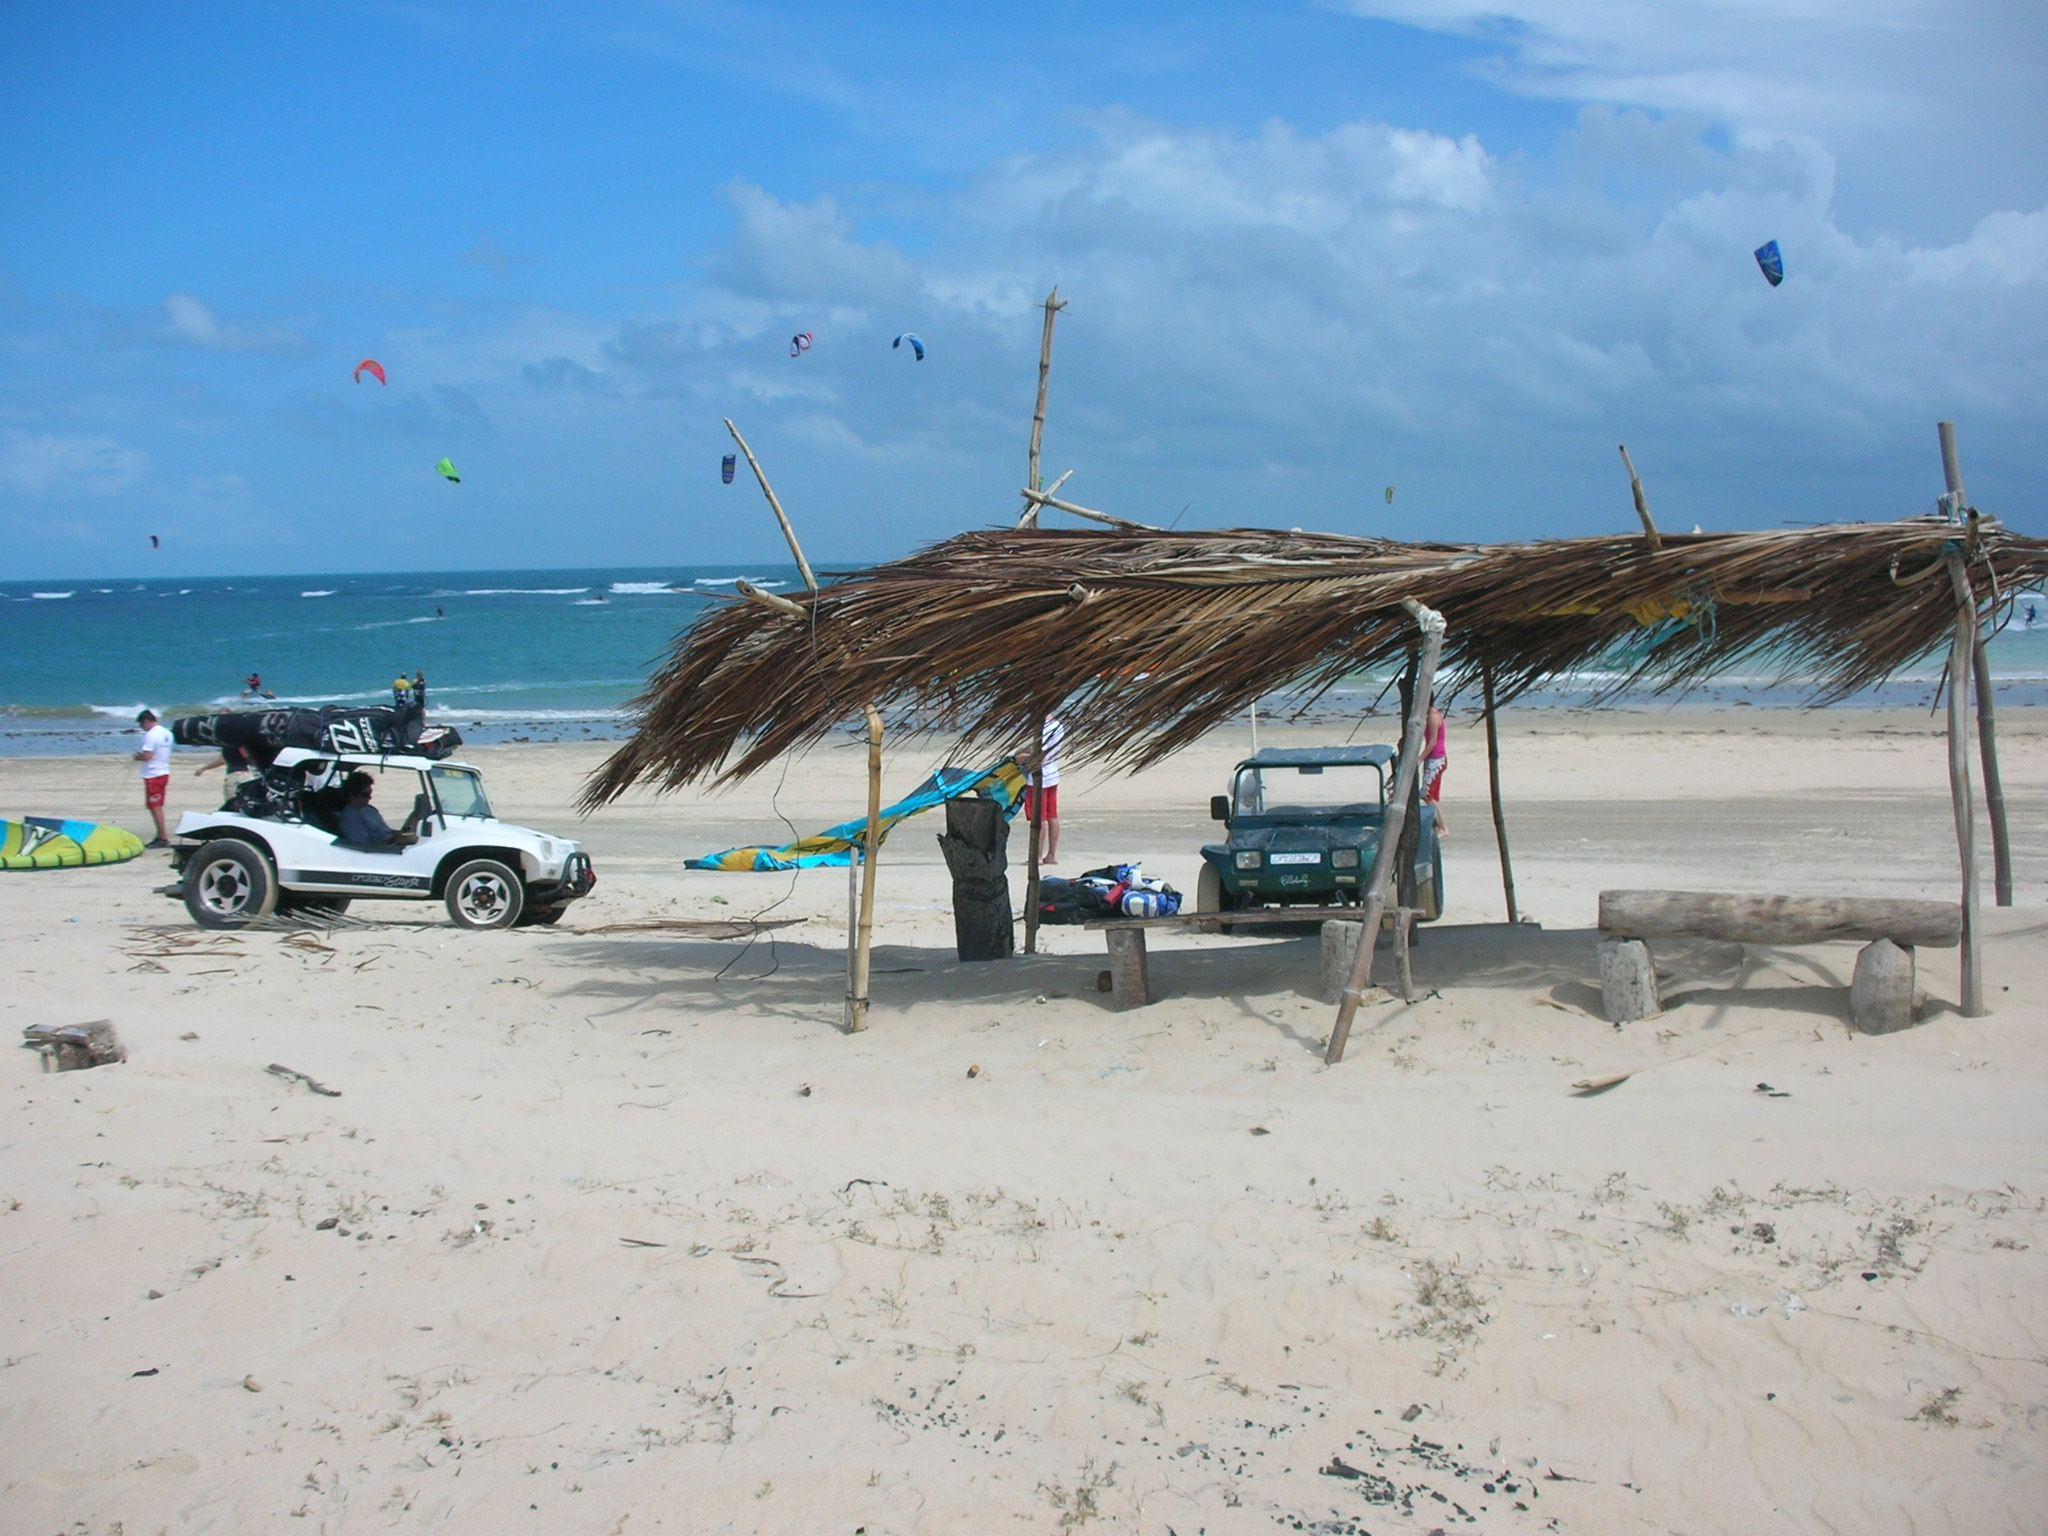 paracuru-spot-kite-kitesurfing1